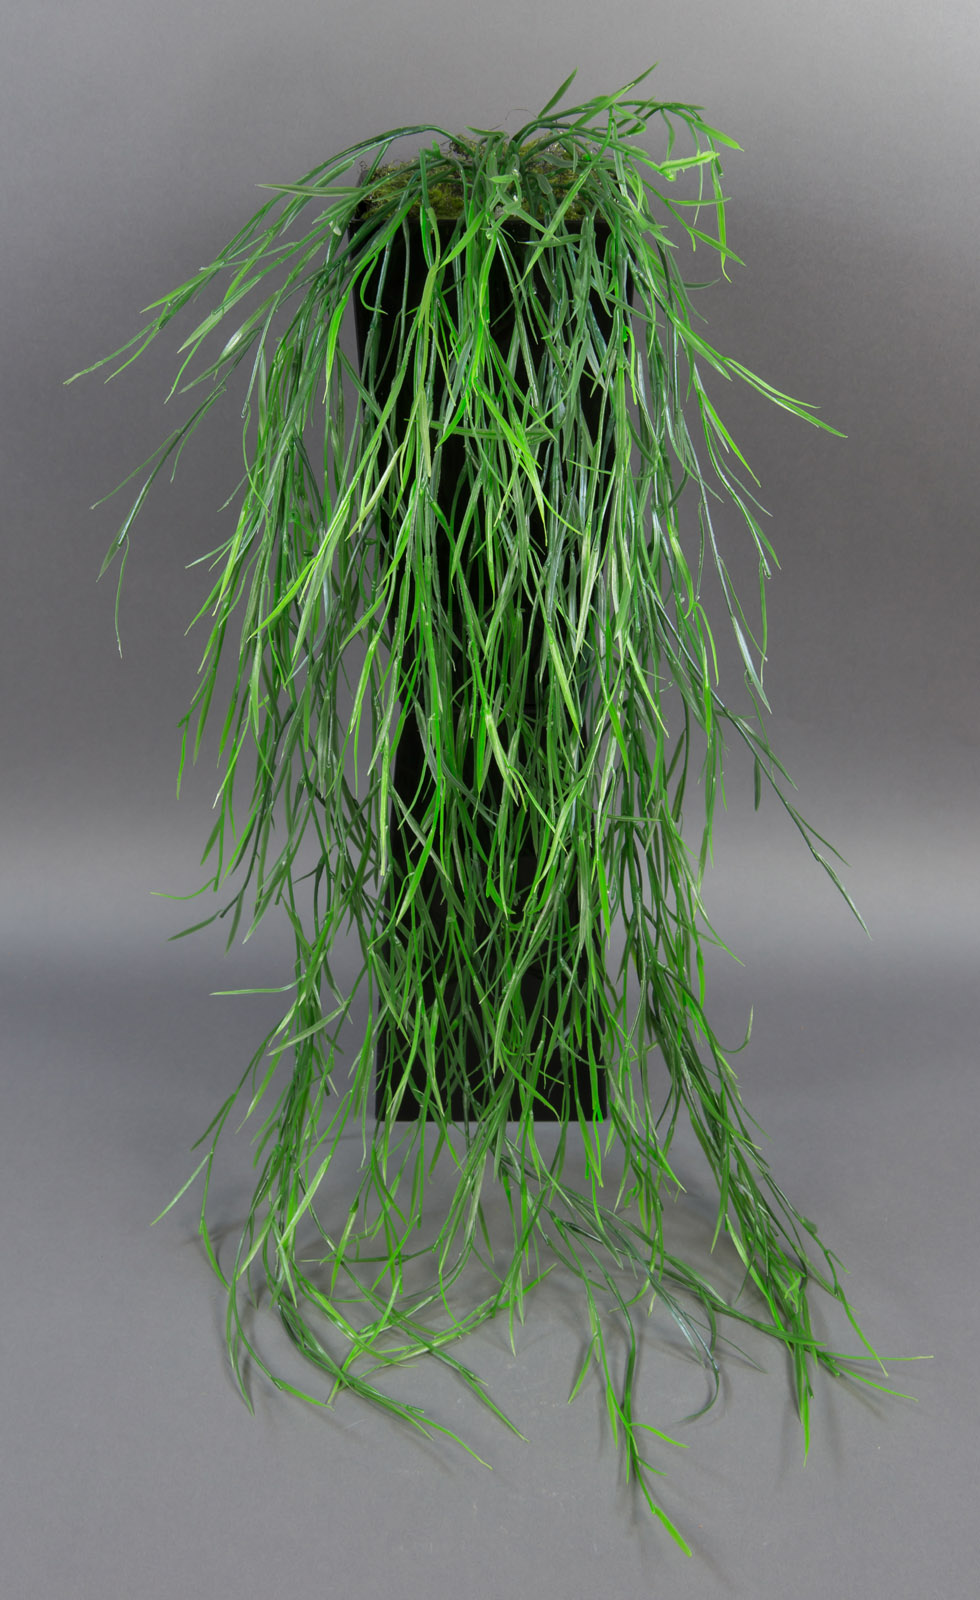 grash nger grasranke 85cm fp k nstliche pflanzen ranken farn kunstpflanzen ebay. Black Bedroom Furniture Sets. Home Design Ideas